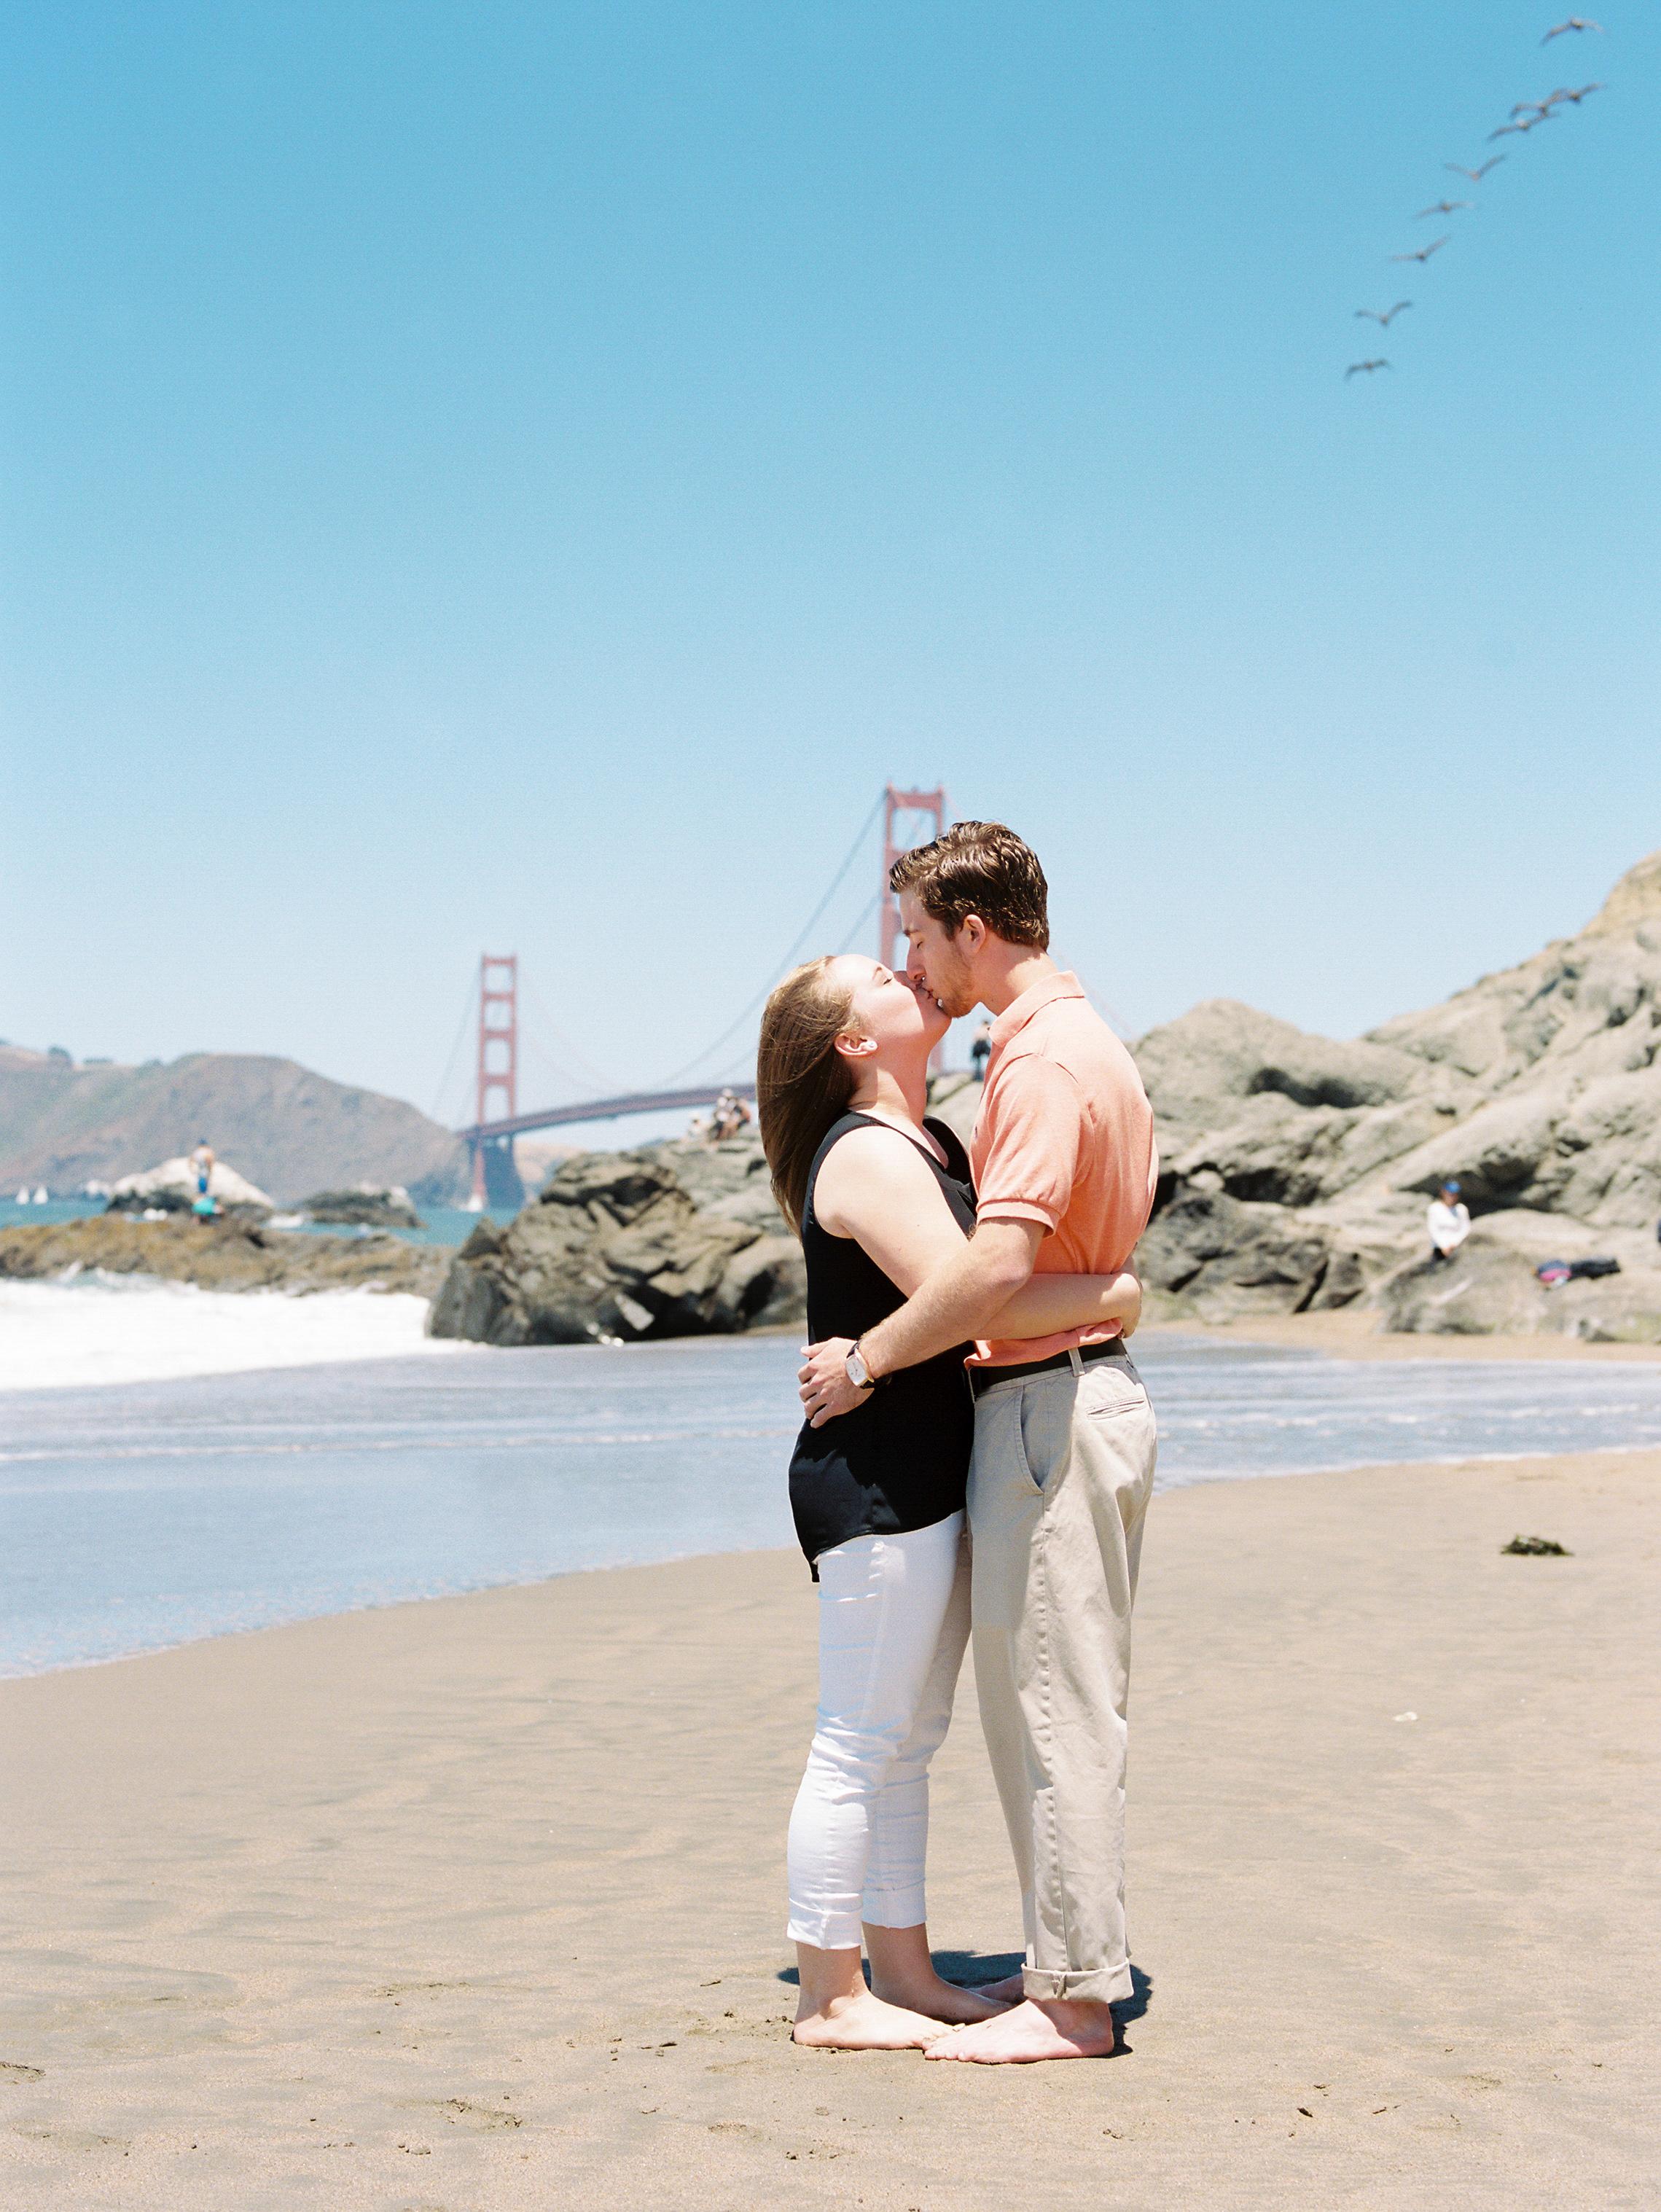 Nick-Drollette-Photography-San-Francisco-102.jpg